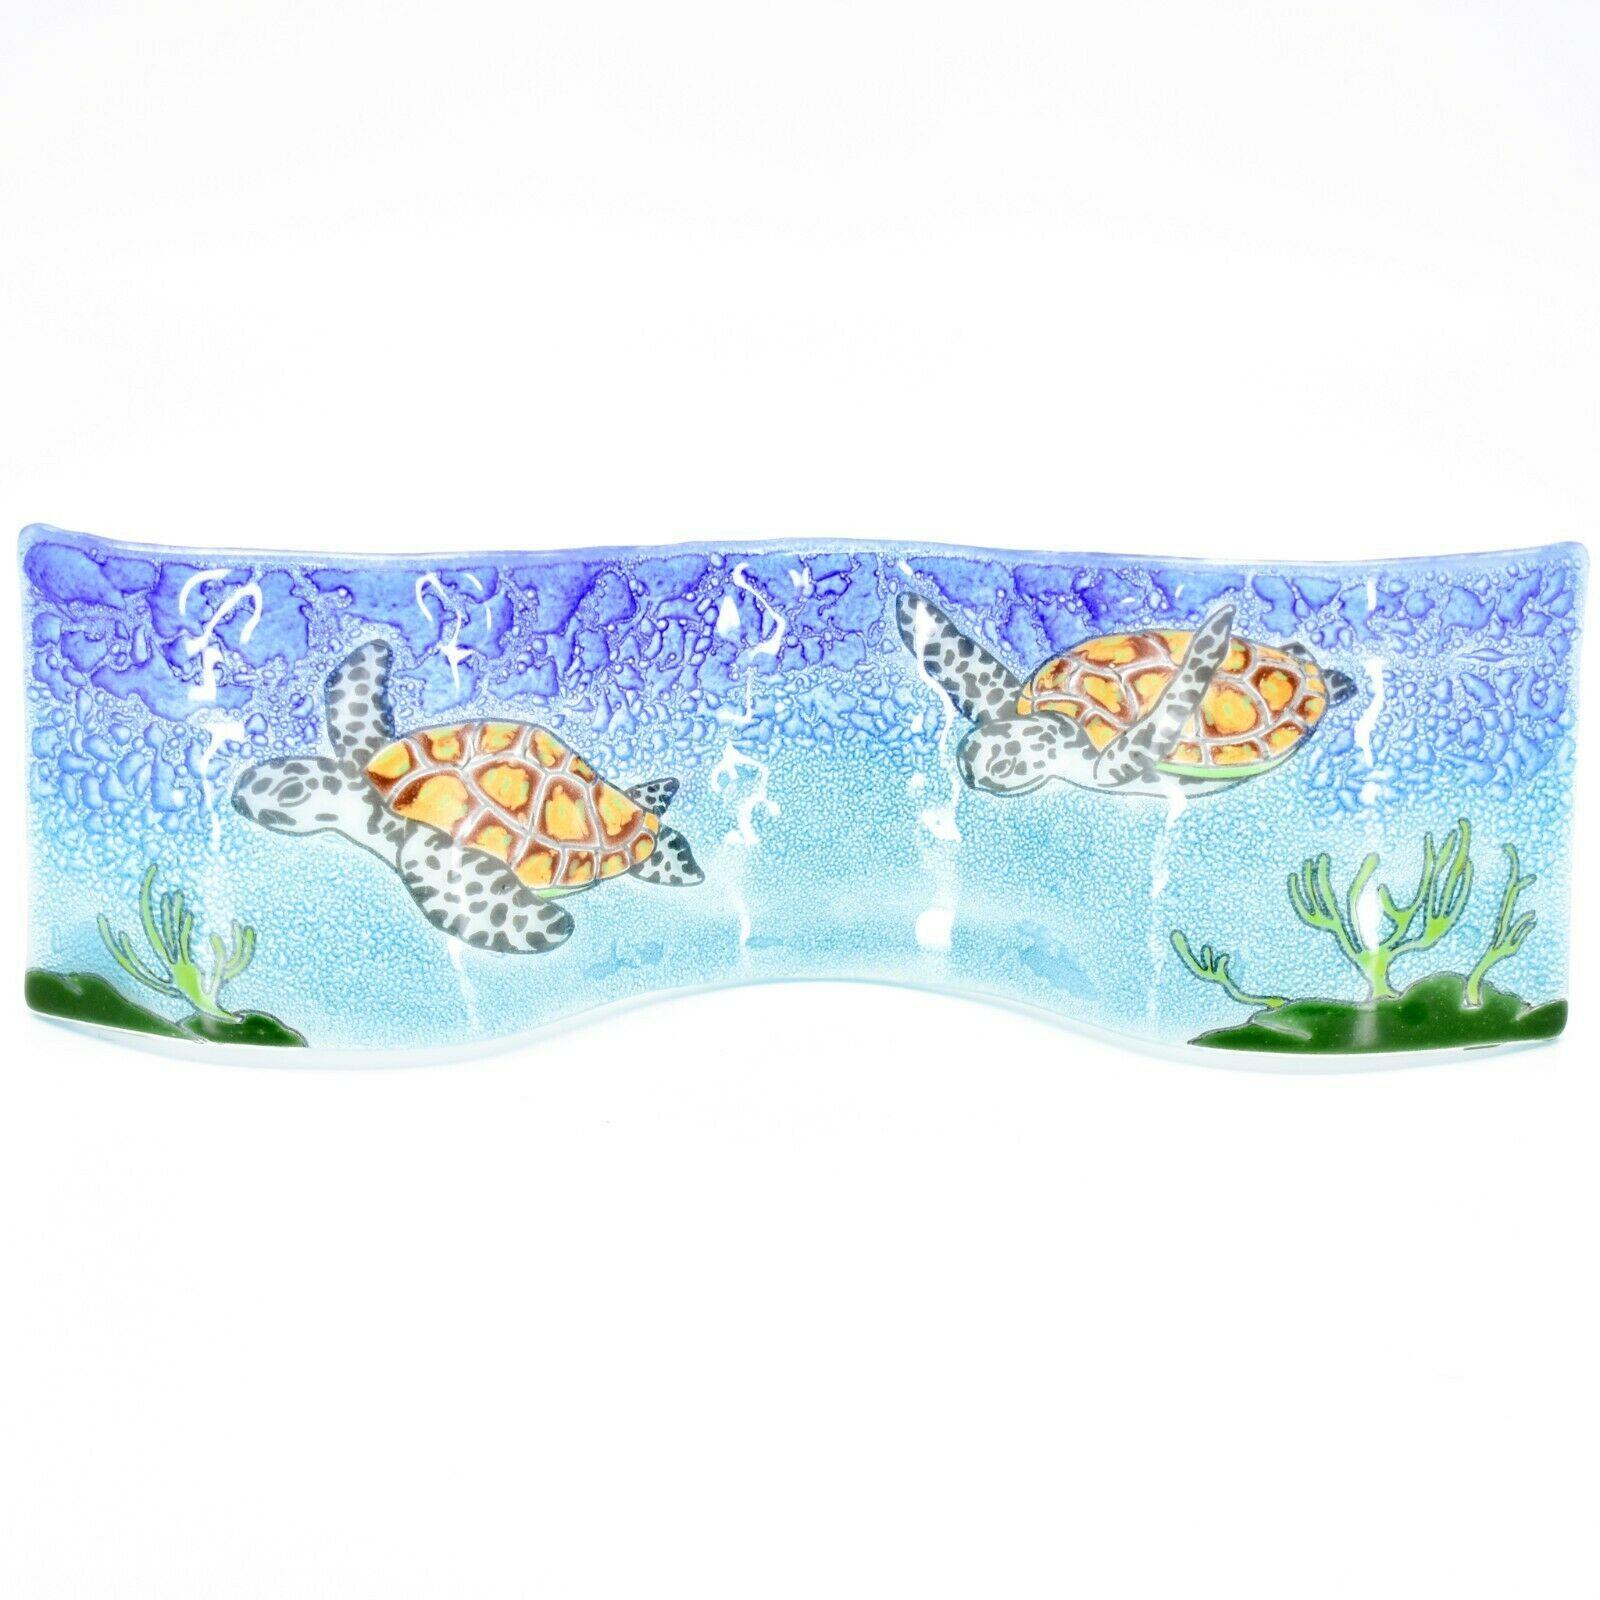 Fused Art Glass Ocean Sea Turtle Wavy Decor Sun Catcher Handmade in Ecuador